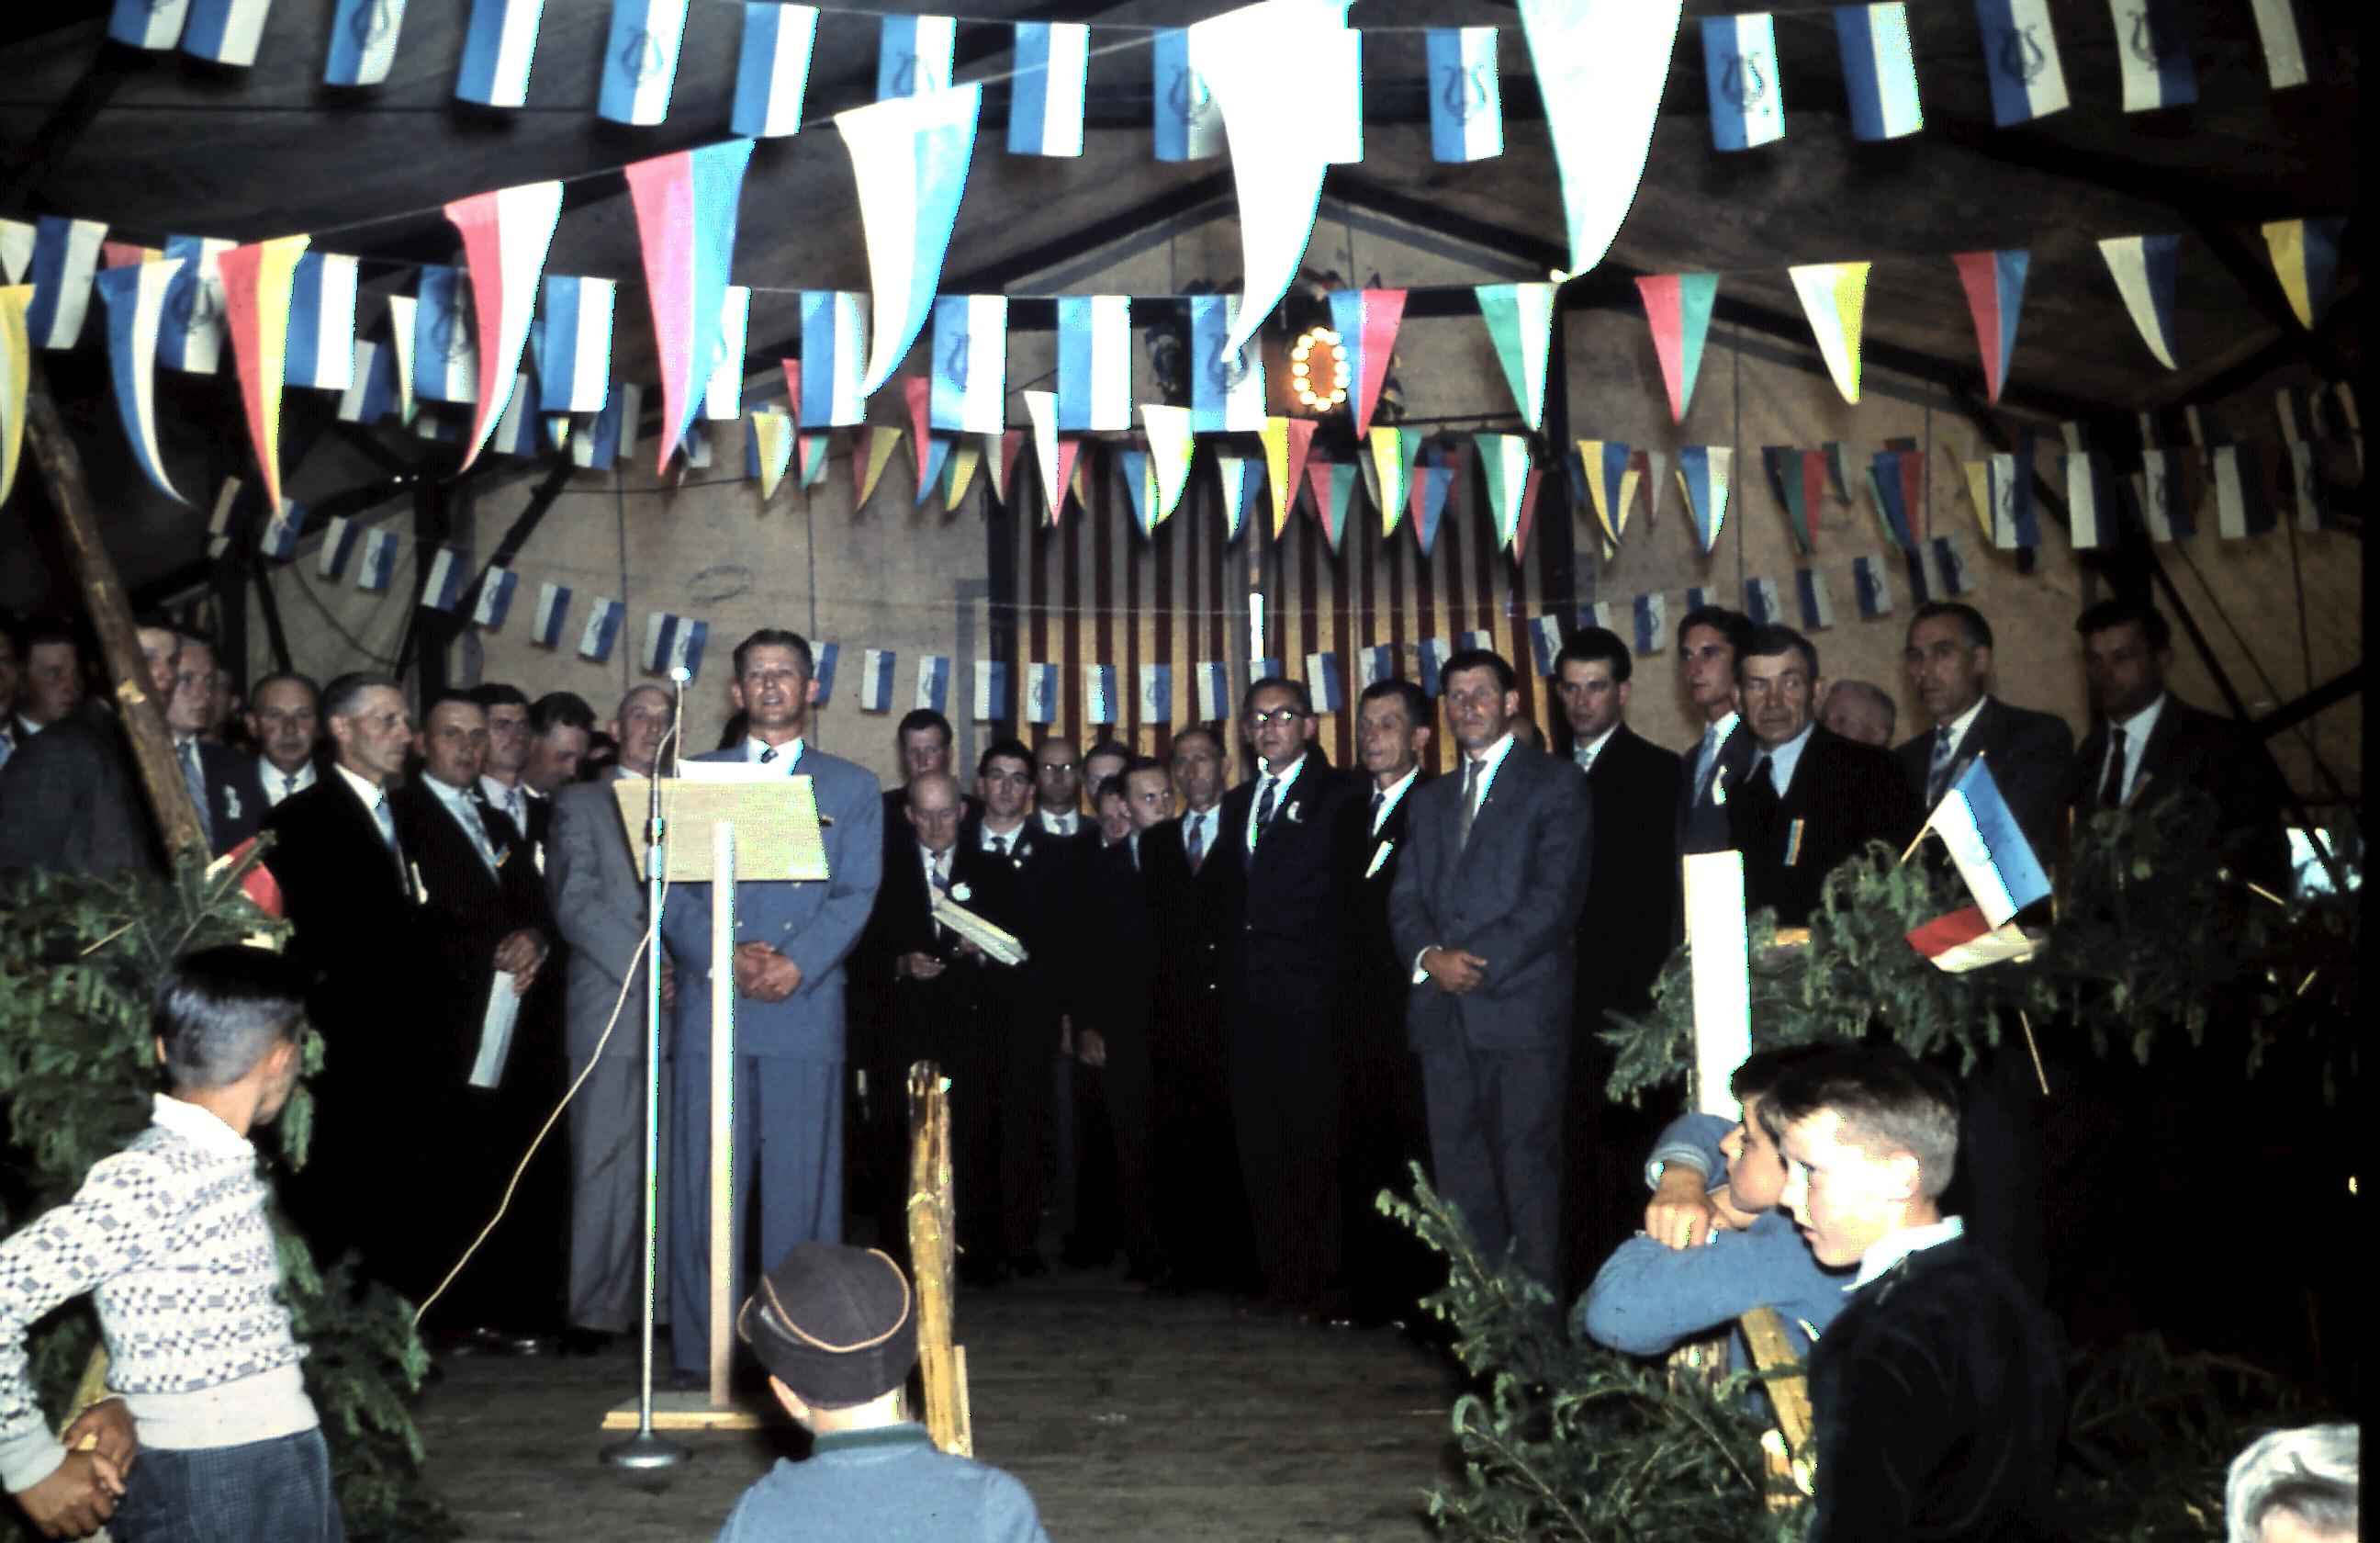 1-saengerfest-1959-0017.jpg